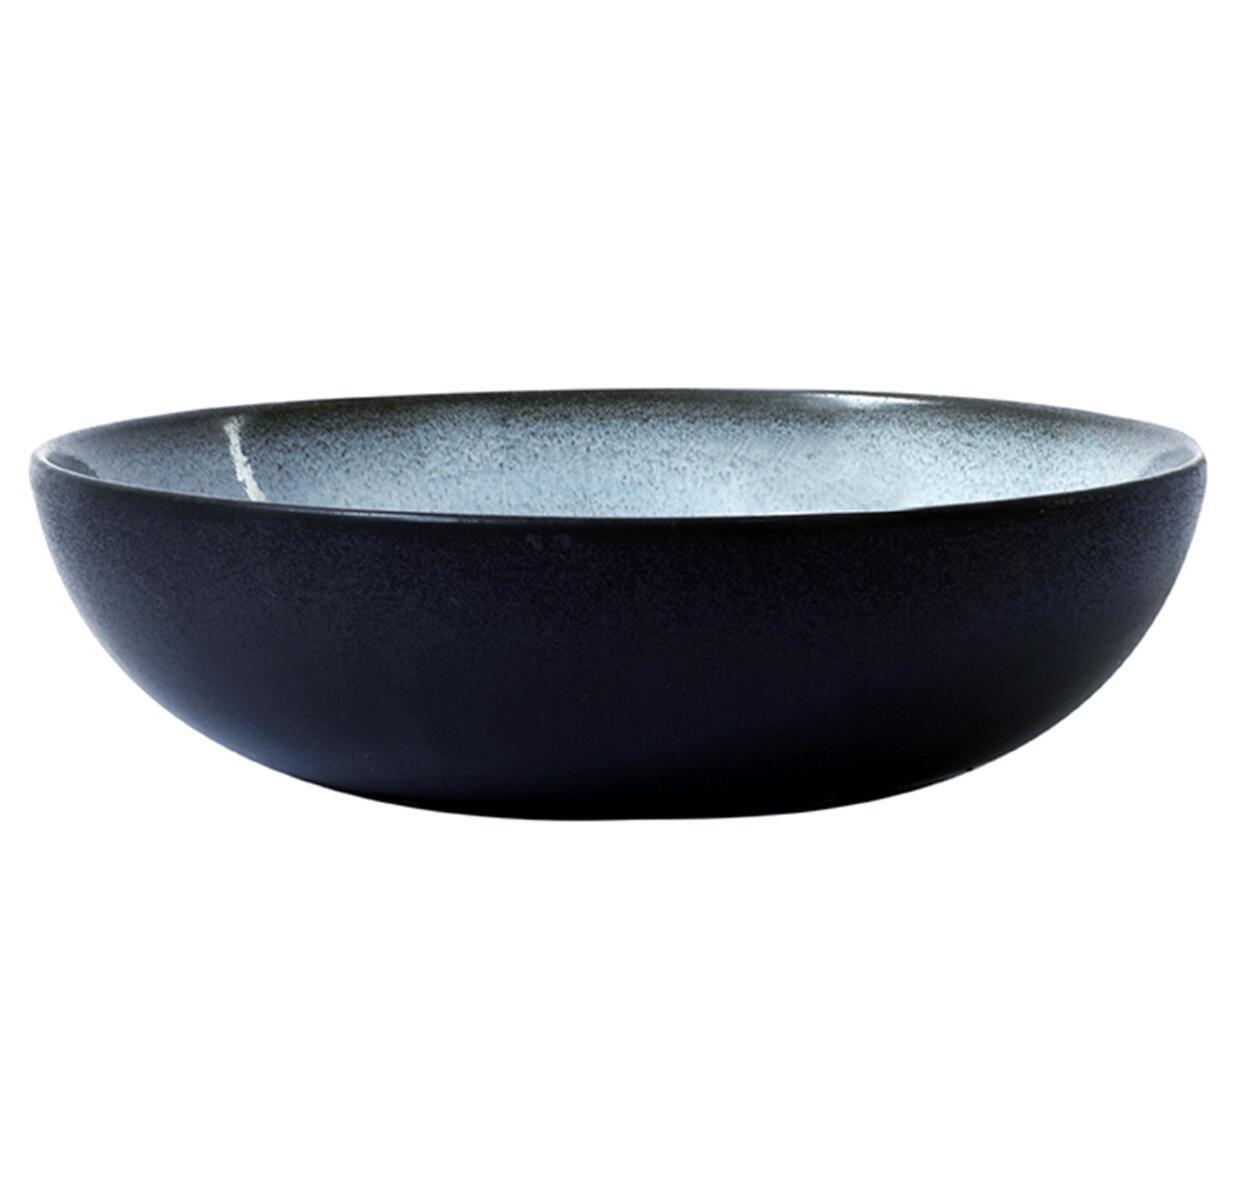 Serving Bowl - Tourron - Large - Blue/Grey-1